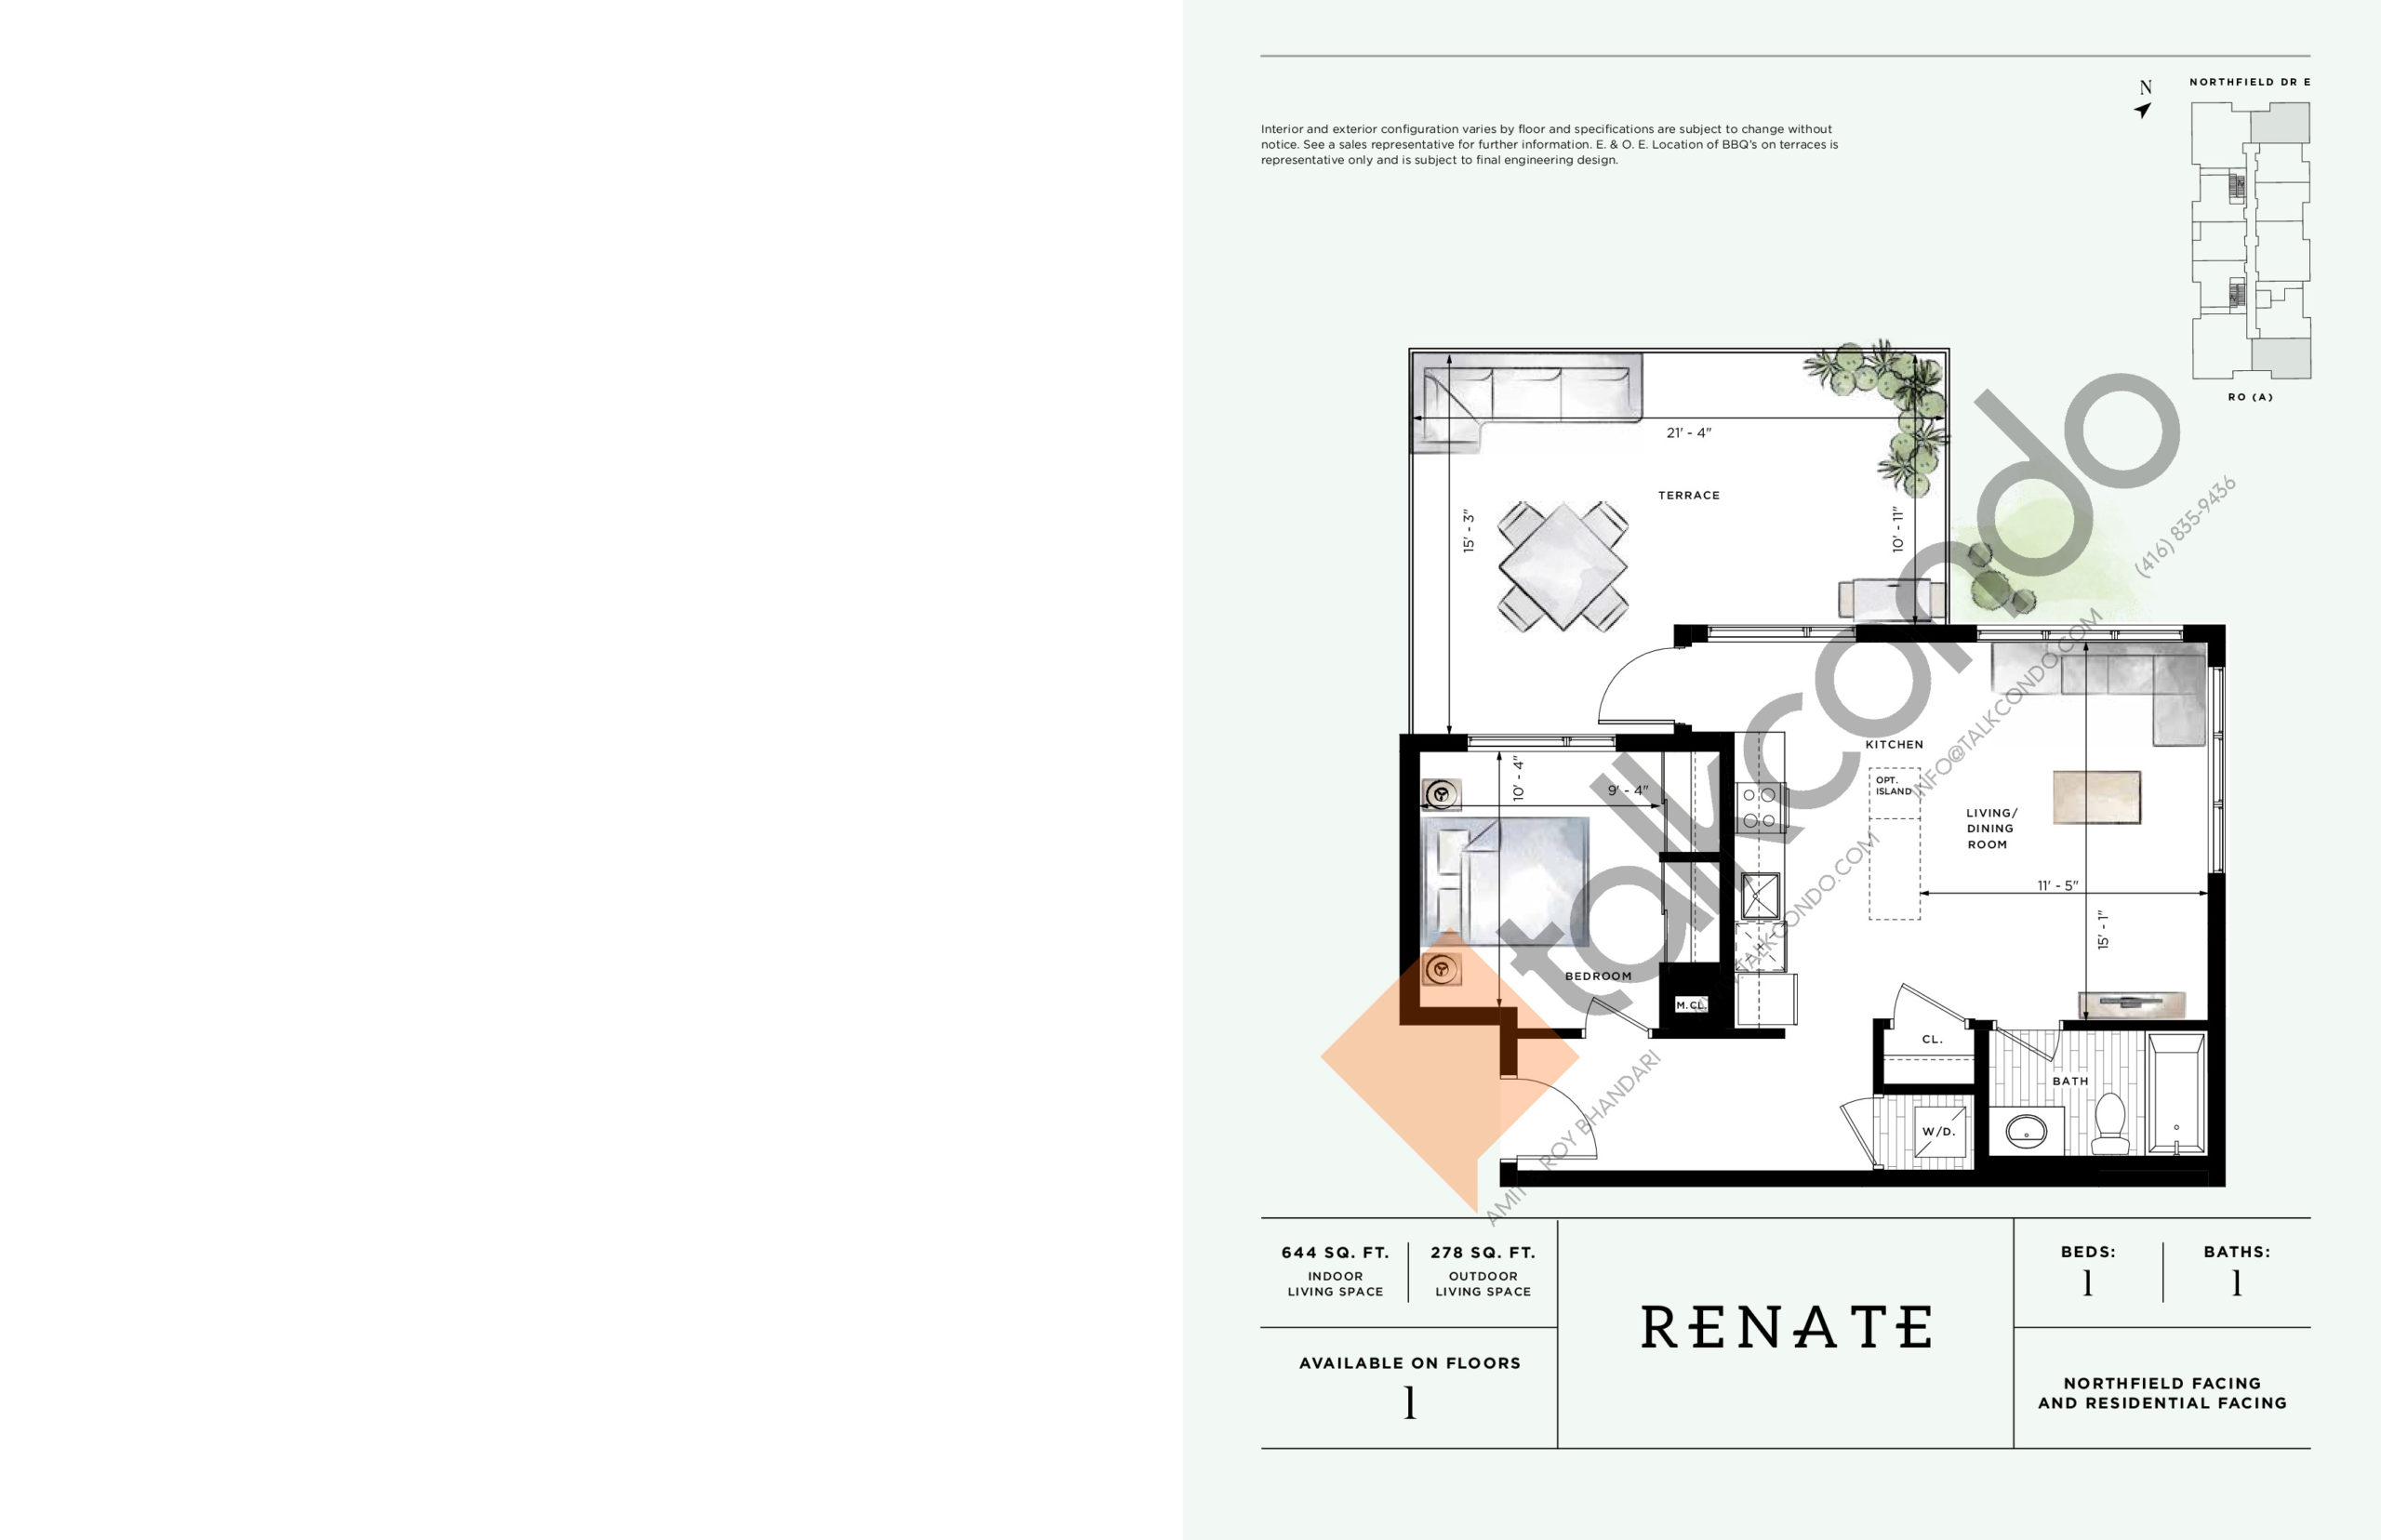 Renate Floor Plan at Ro at Blackstone Condos - 644 sq.ft